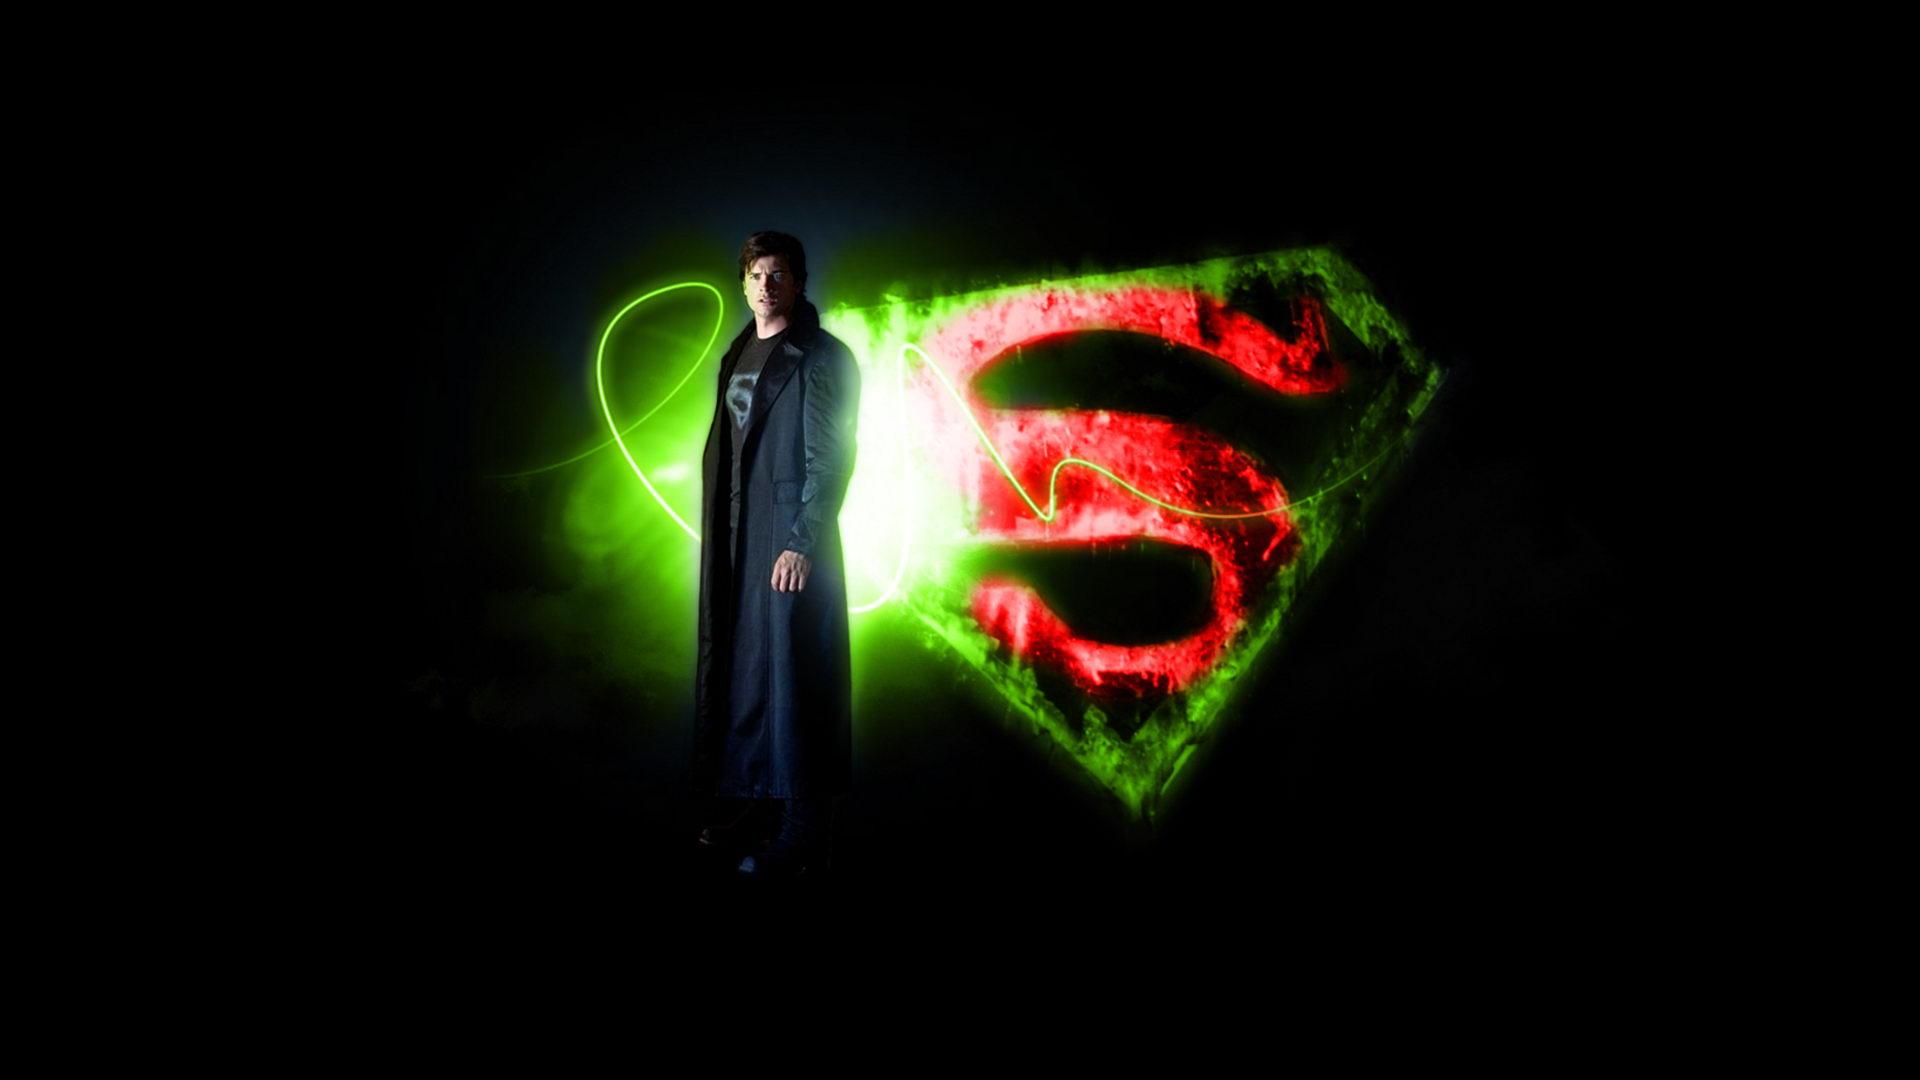 Smallville wallpaper 2